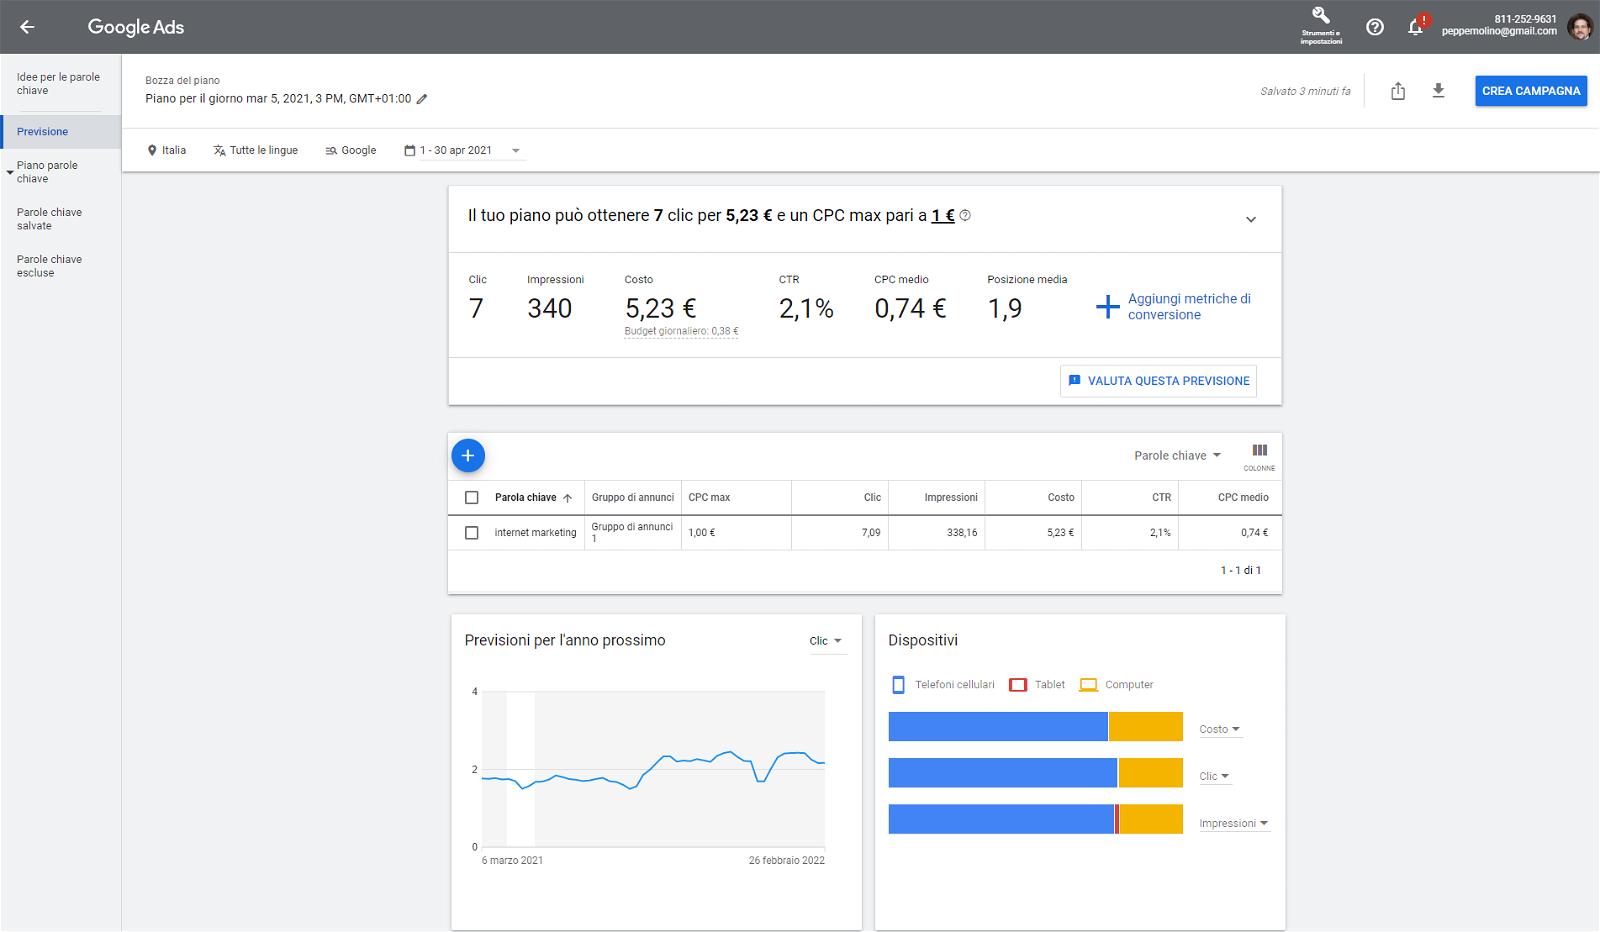 Google-Ads Previsione keyword